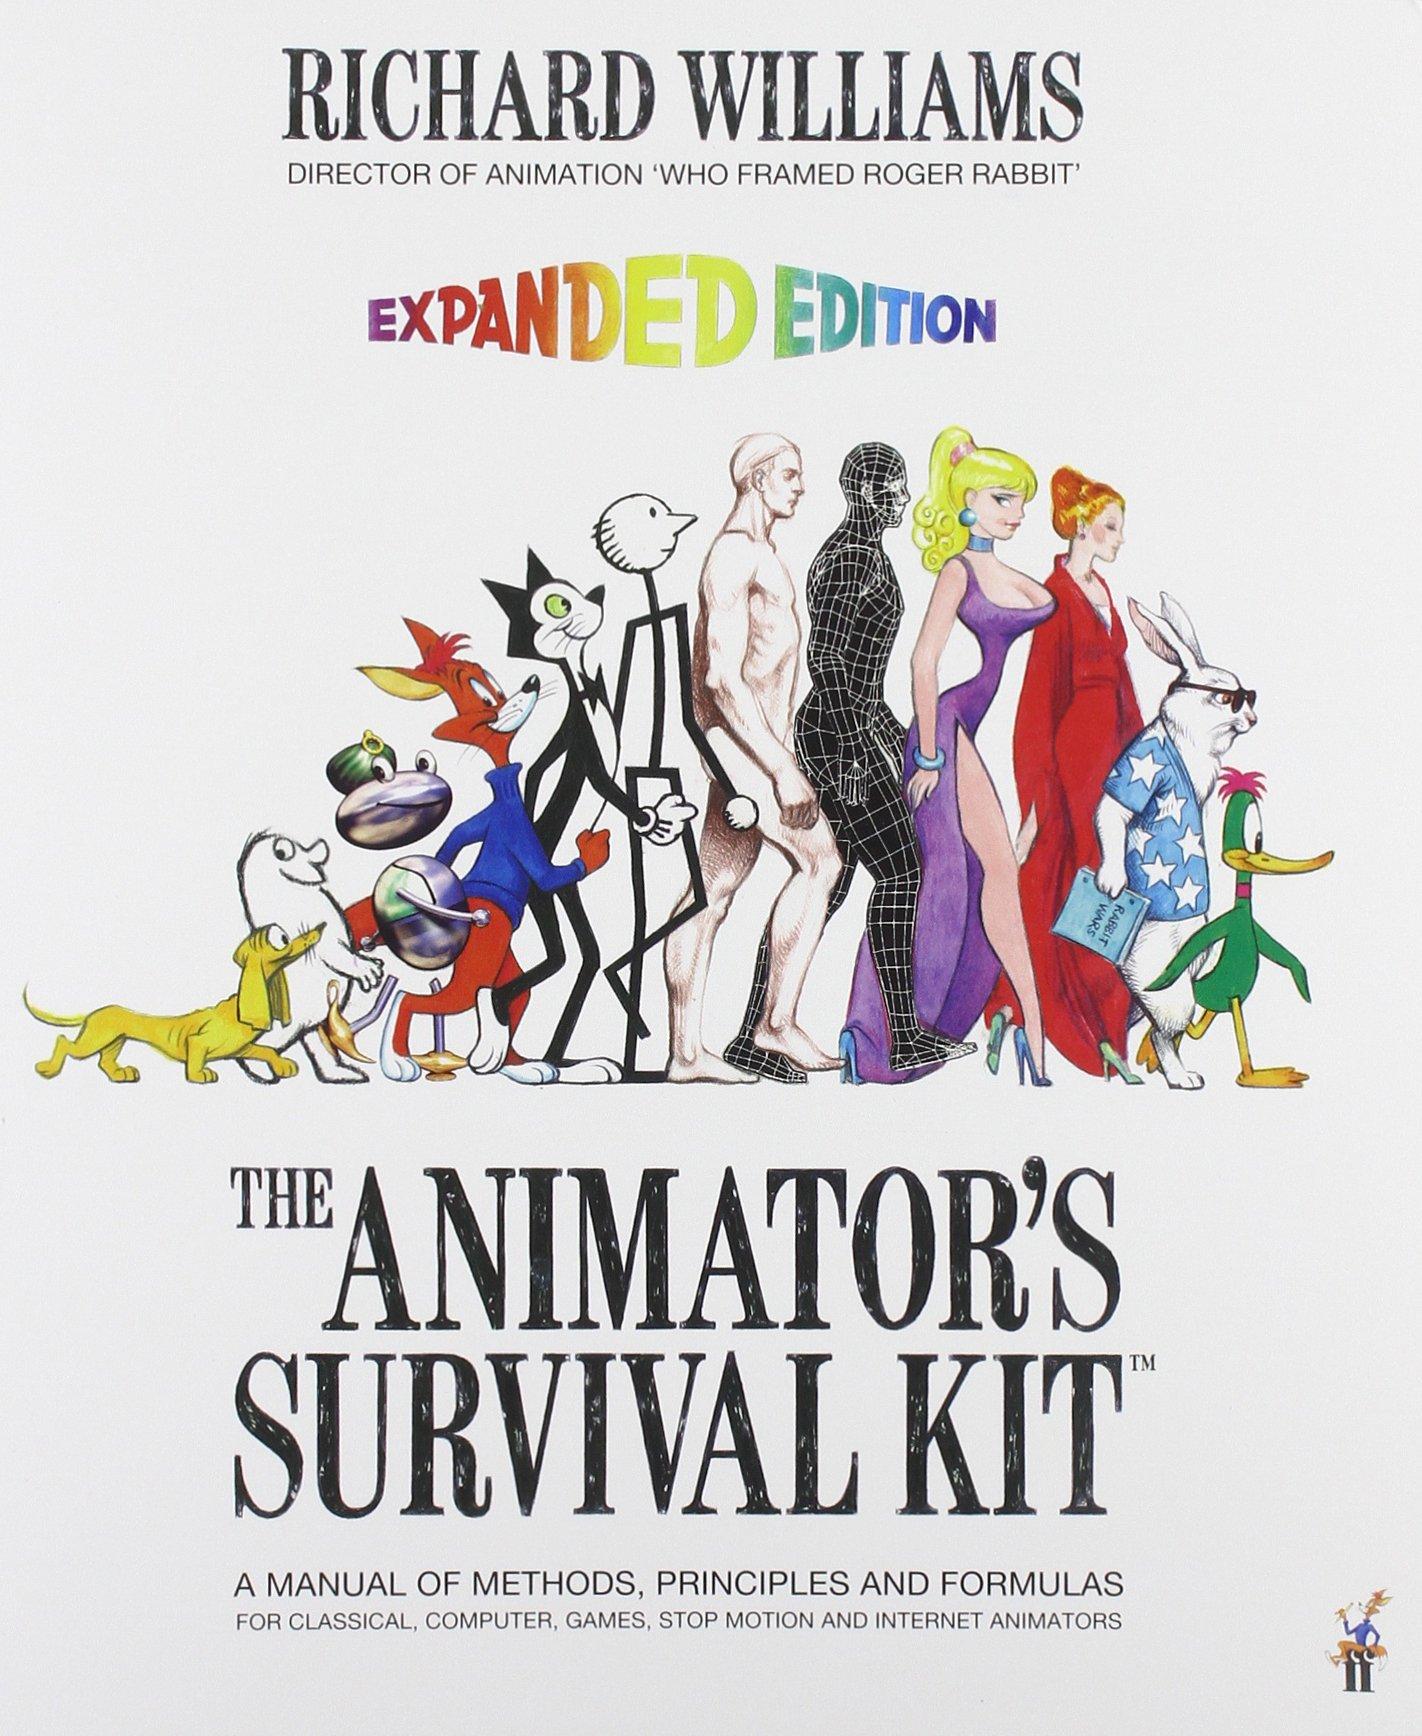 6The Animators Survival Kit